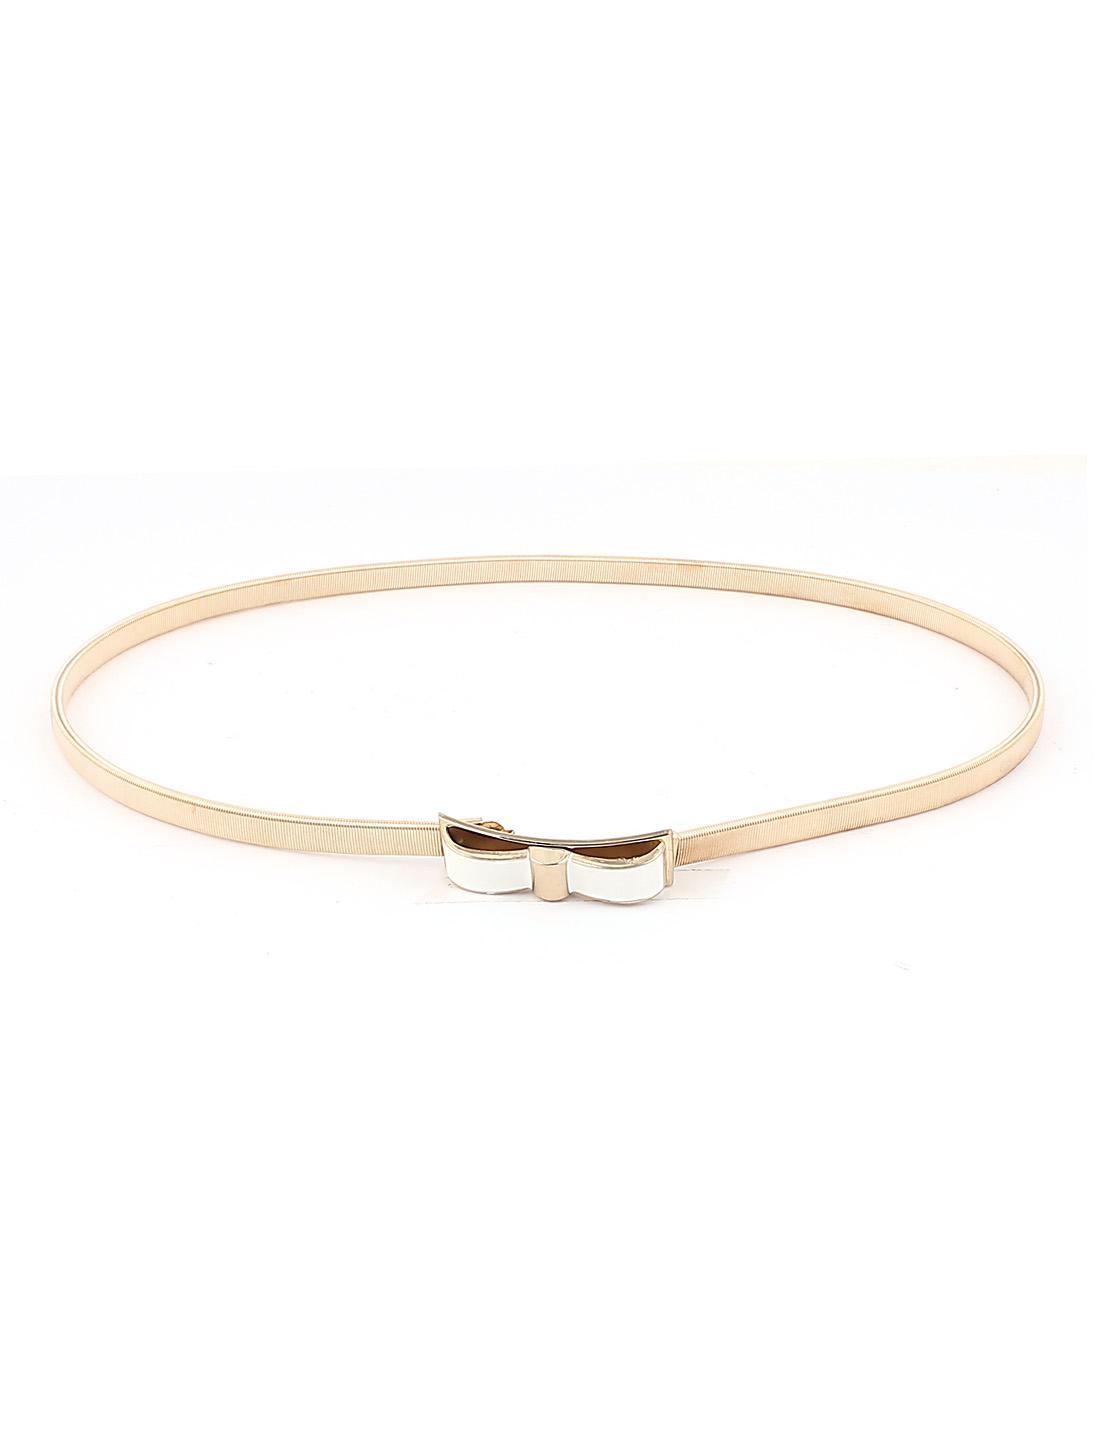 Gold Tone Bowknot Shape Interlocking Buckle Waist Chain for Lady